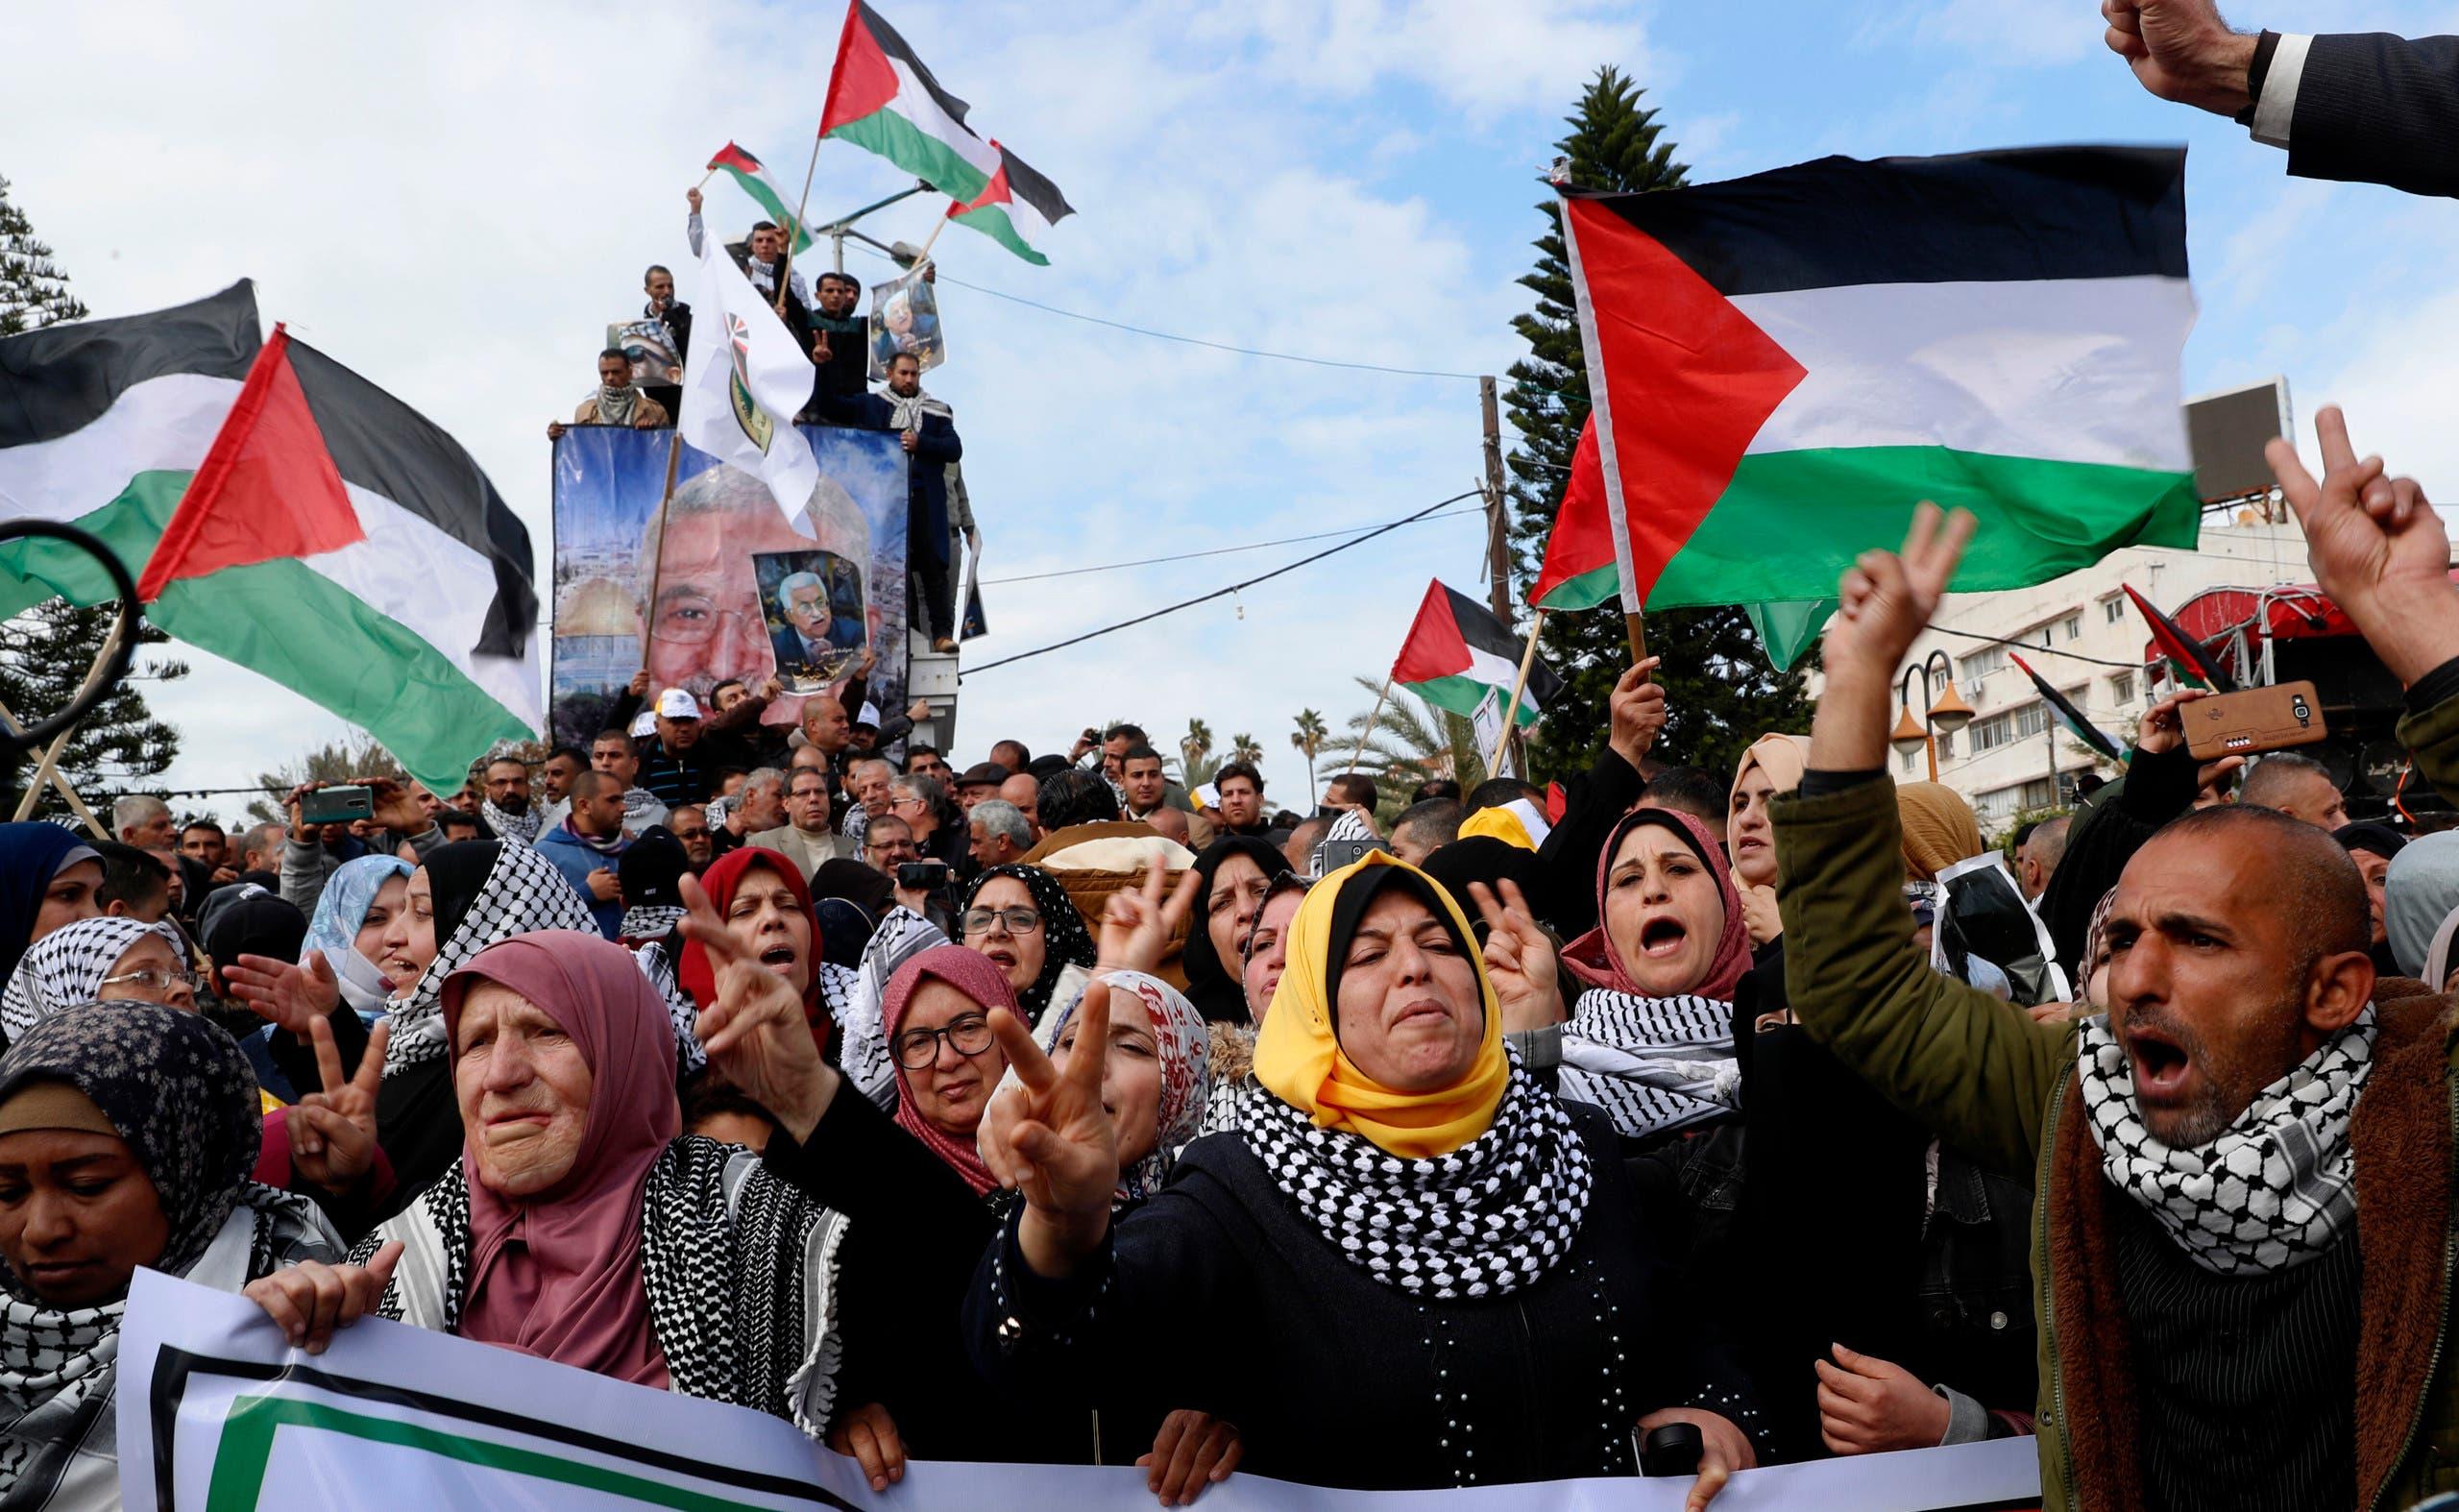 Protestors wave Palestinian flags in Gaza City on Feb. 11, 2020. (AP)